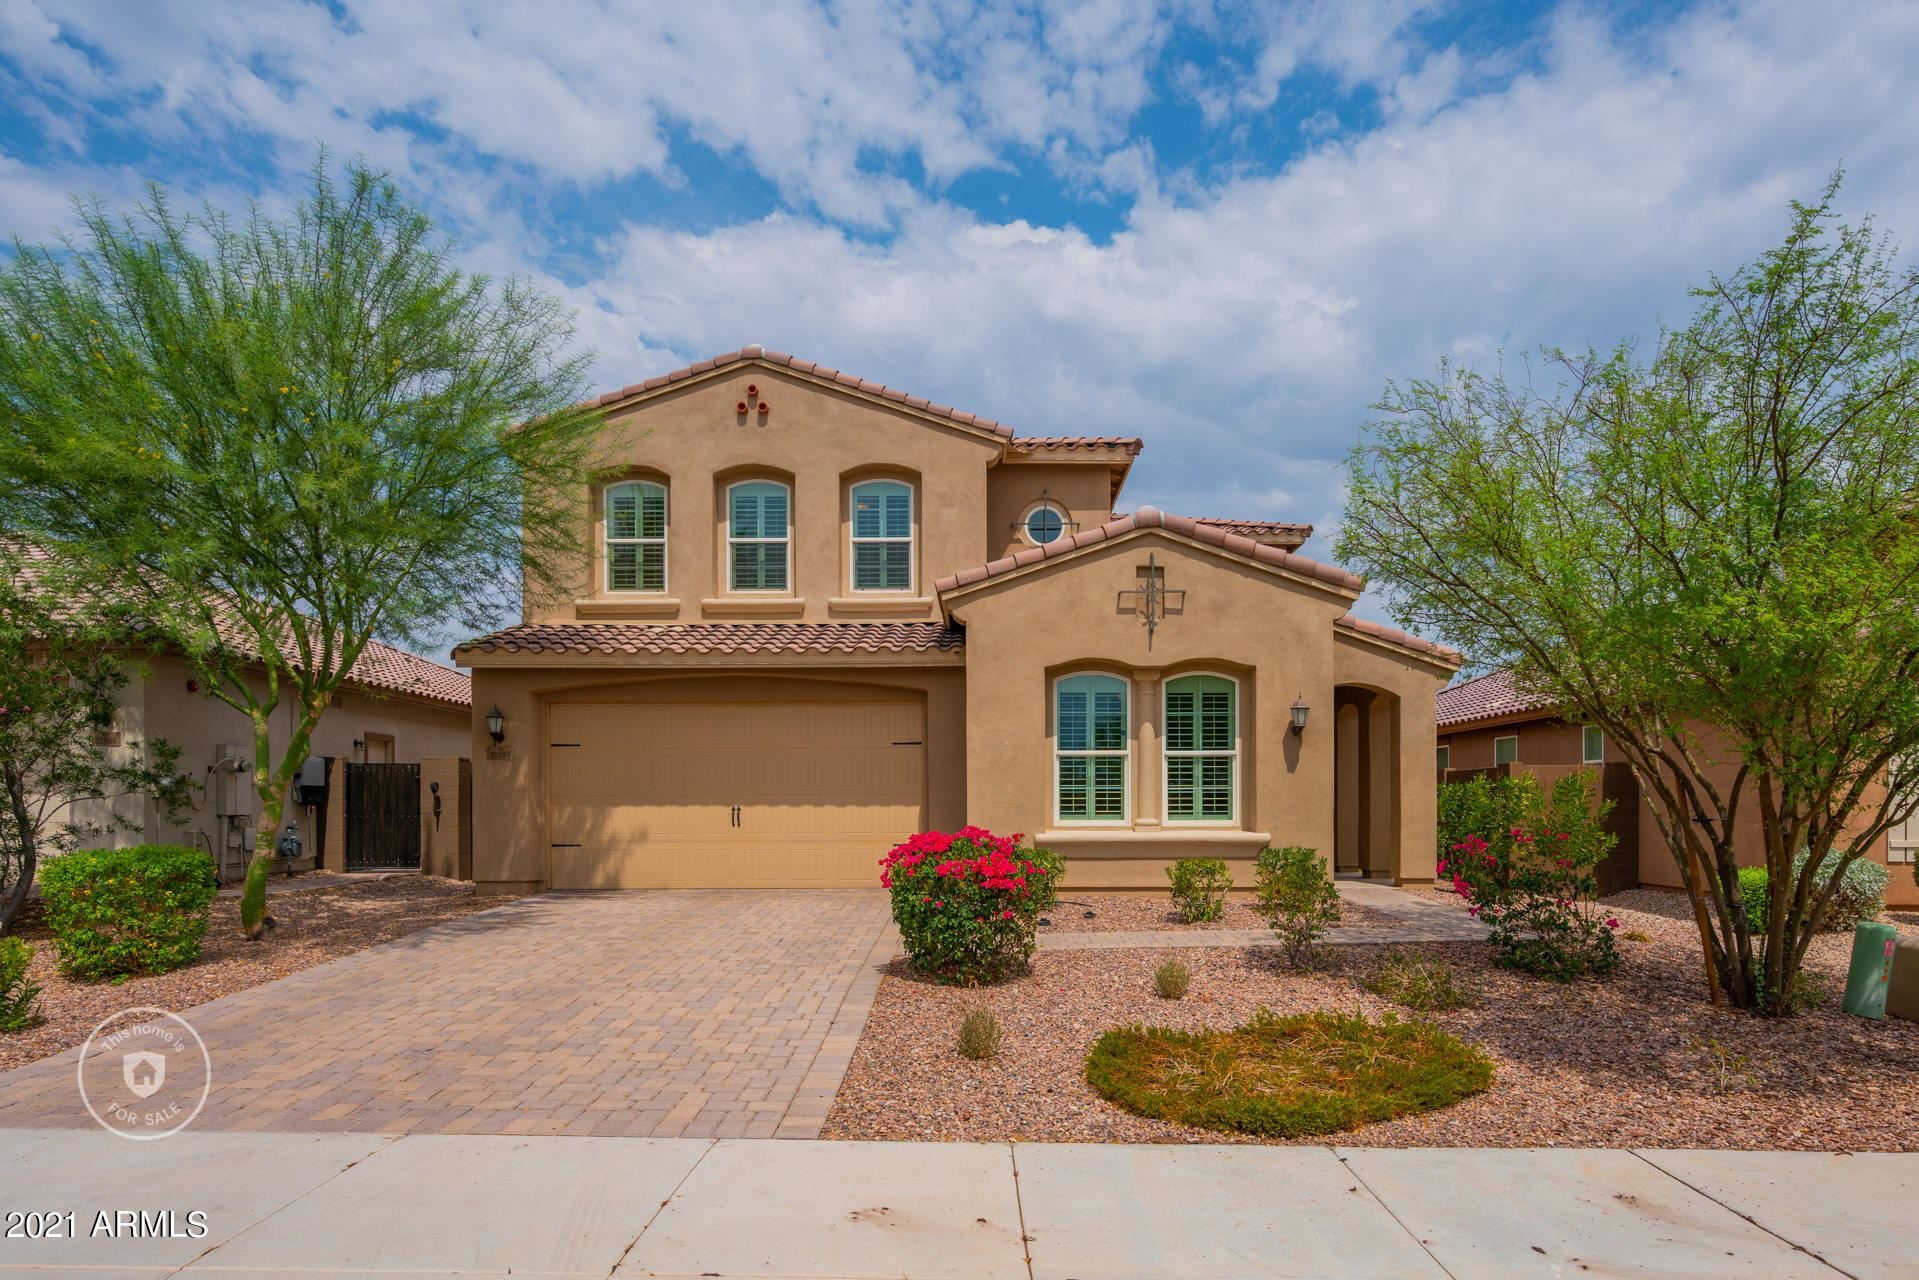 Photo of 32096 N 132ND Drive, Peoria, AZ 85383 (MLS # 6268422)